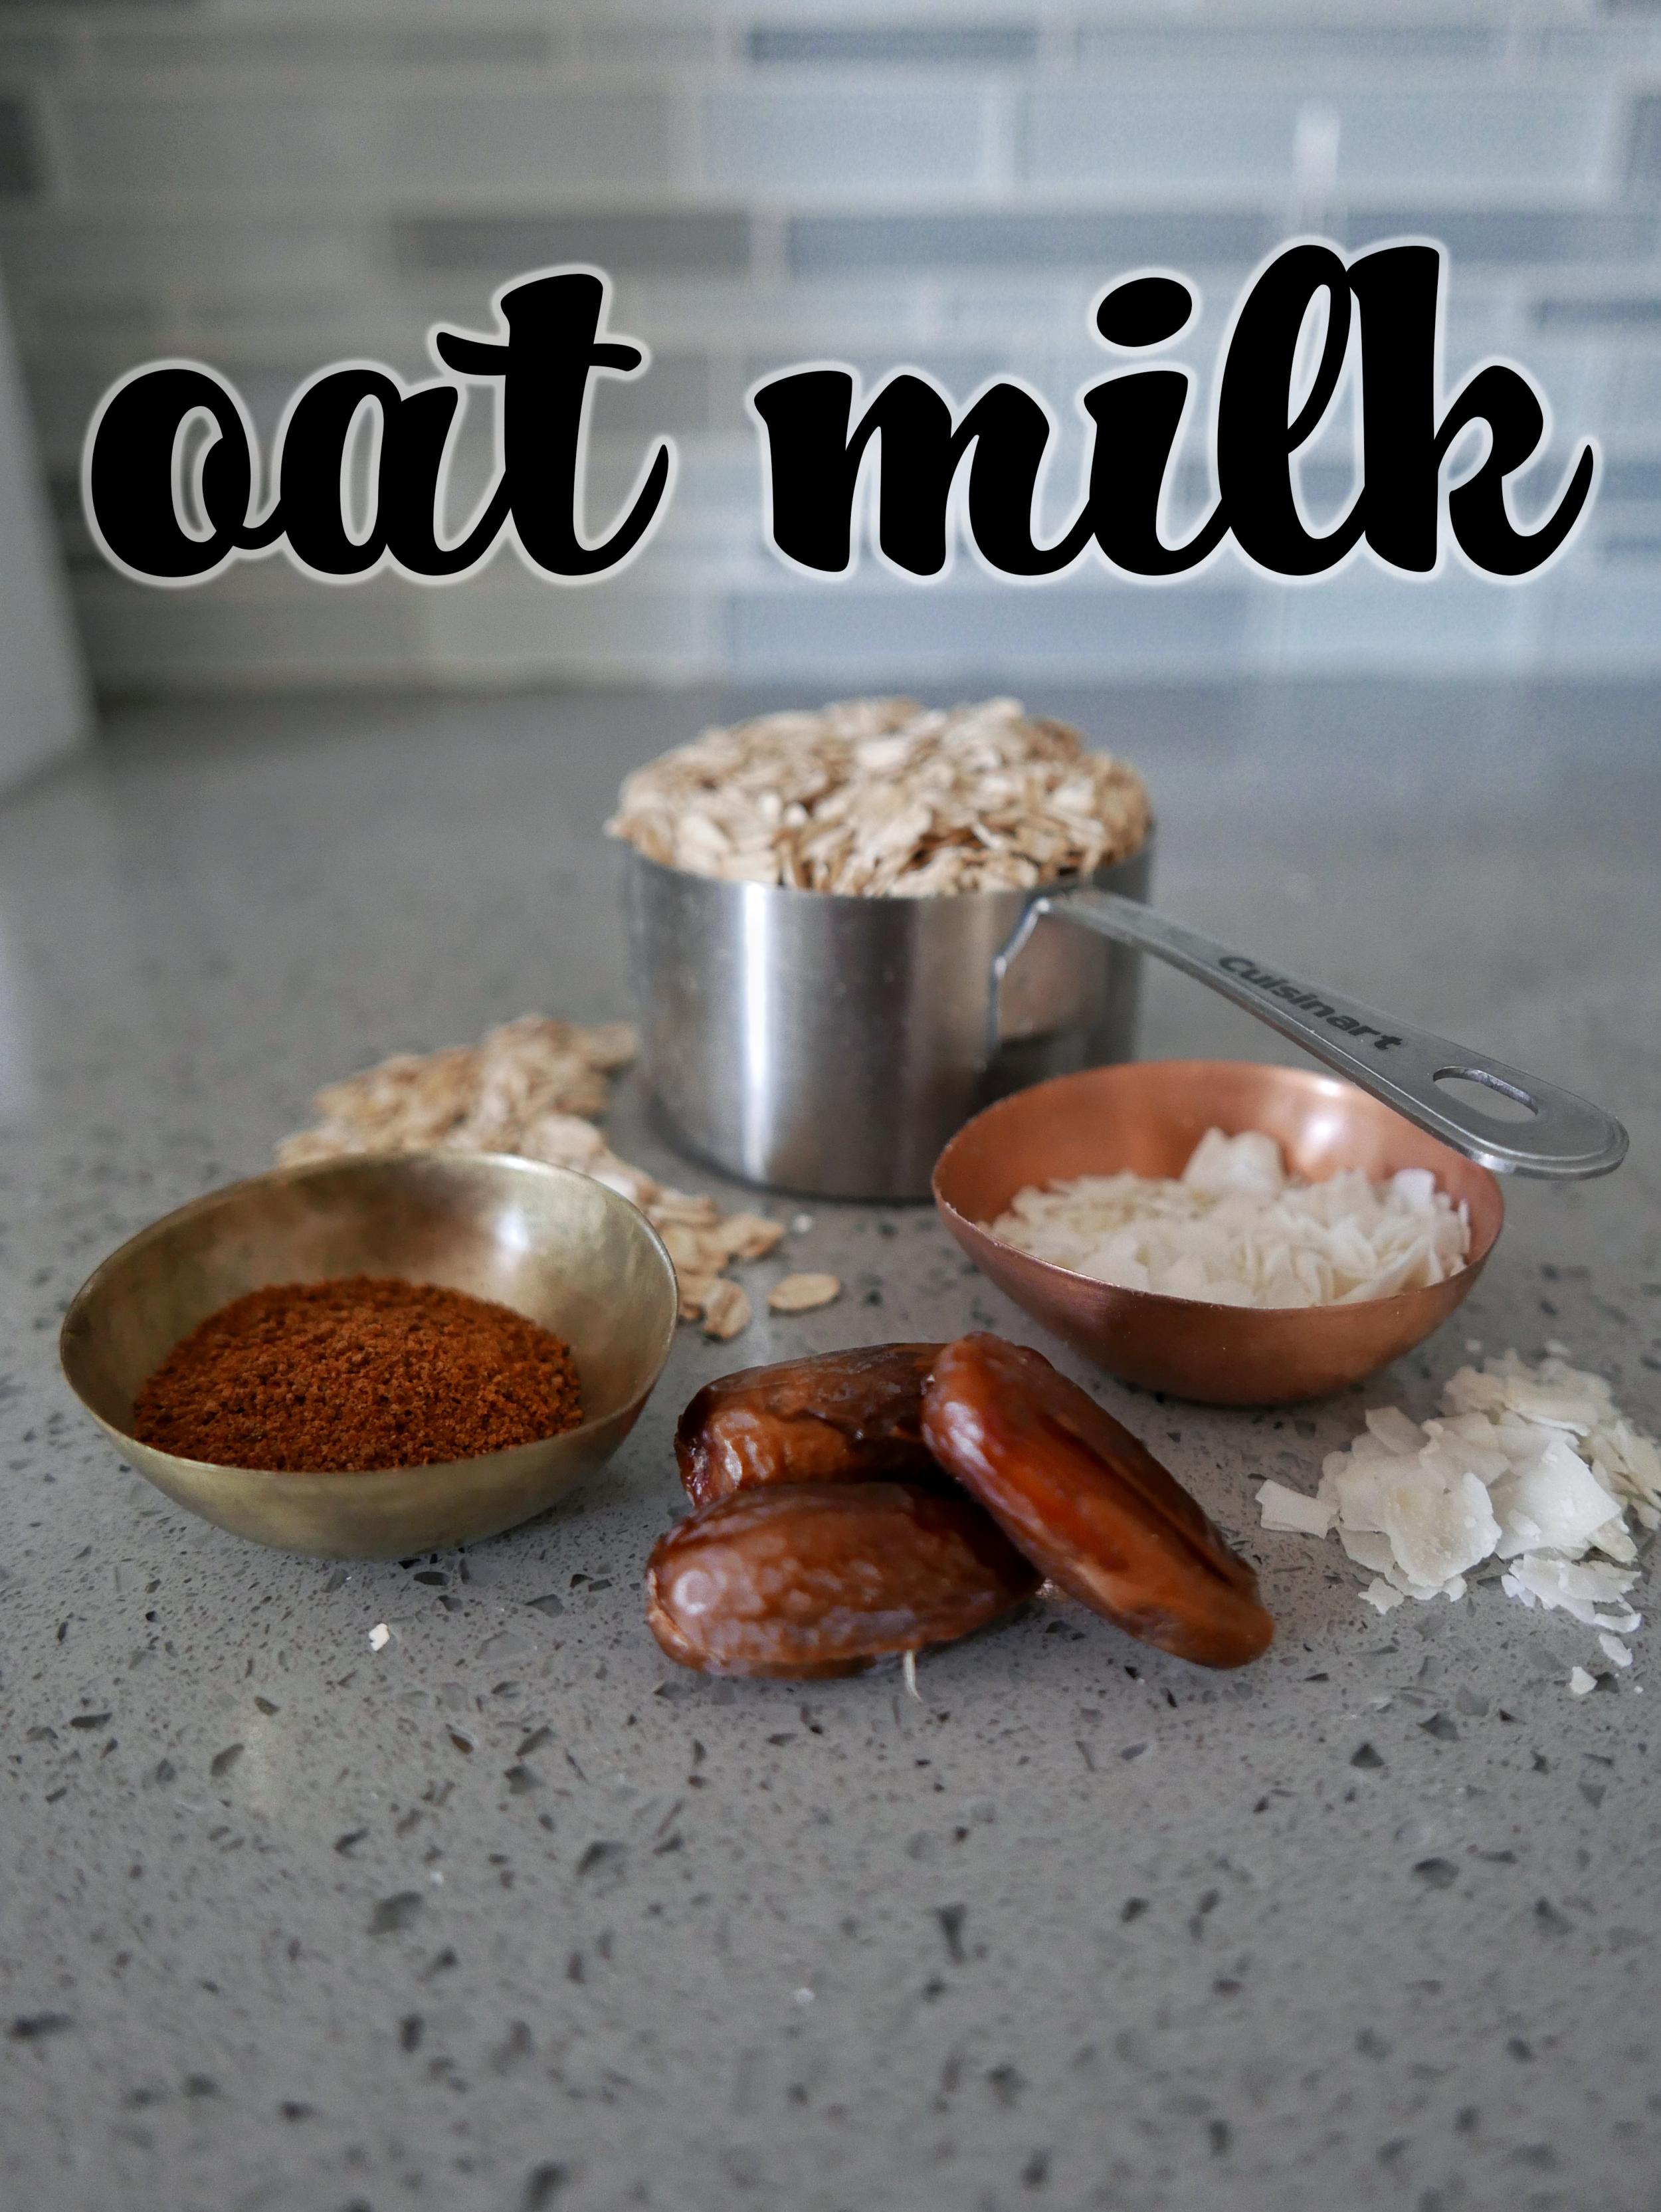 oat milk topshot.png